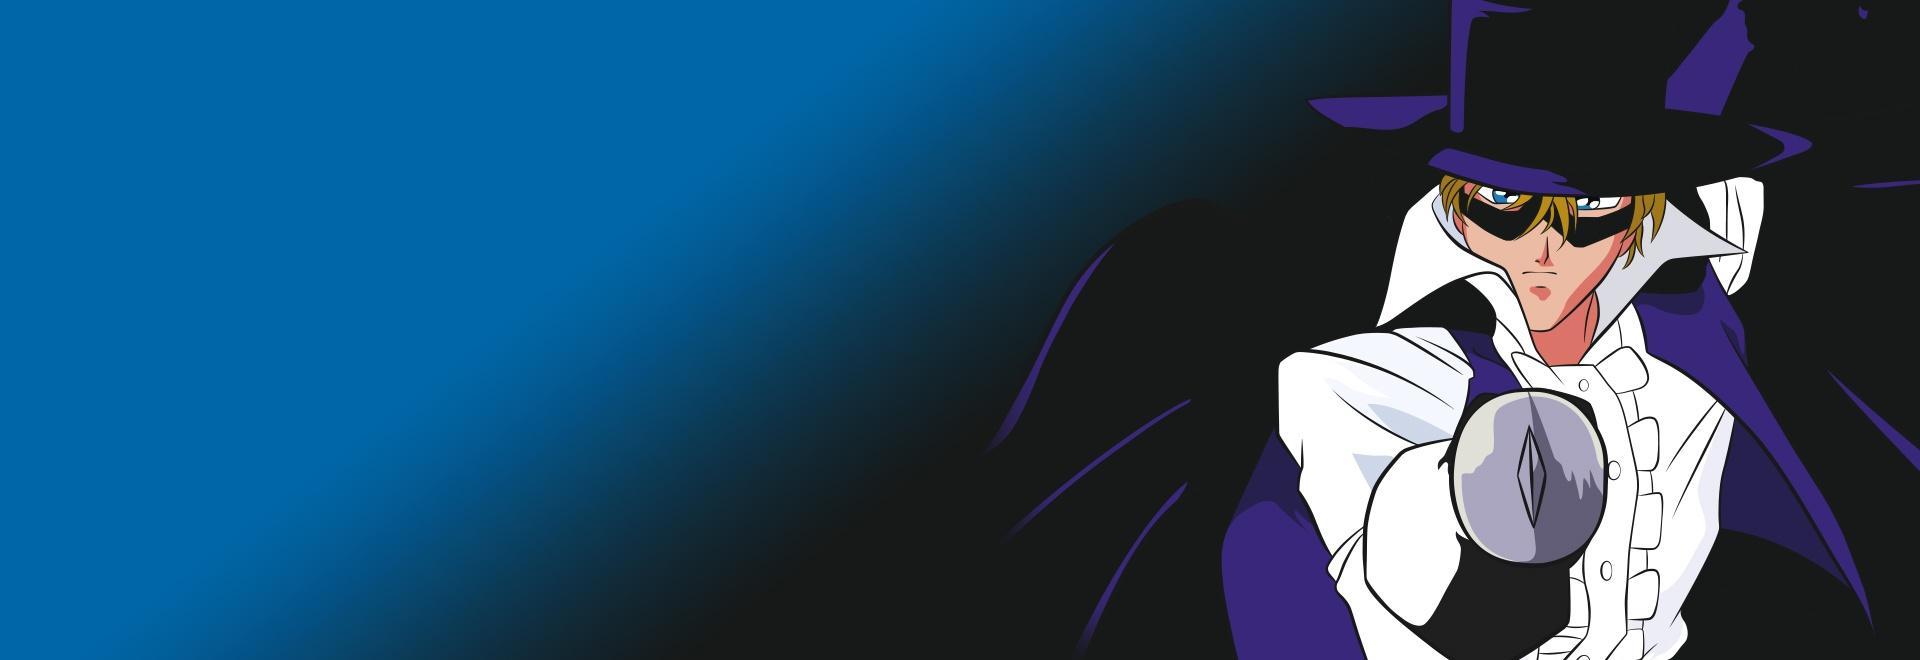 Zorro smascherato